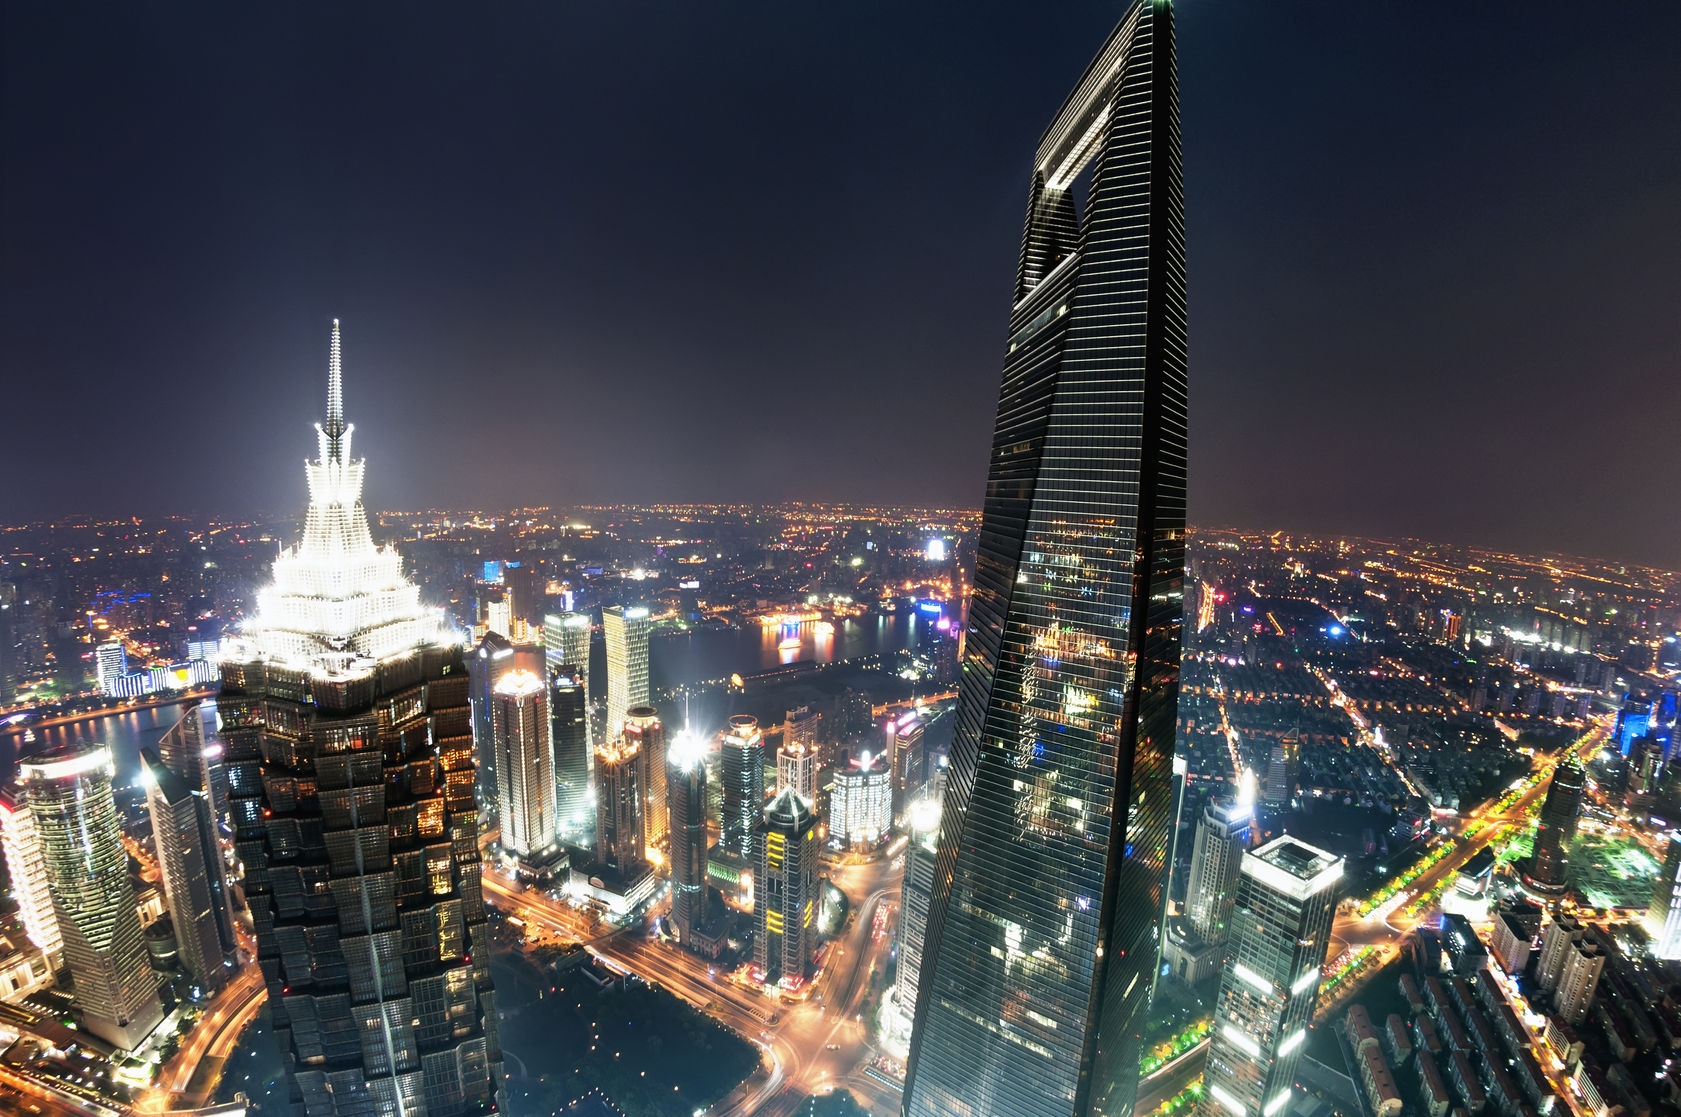 Shanghai, skyscraper